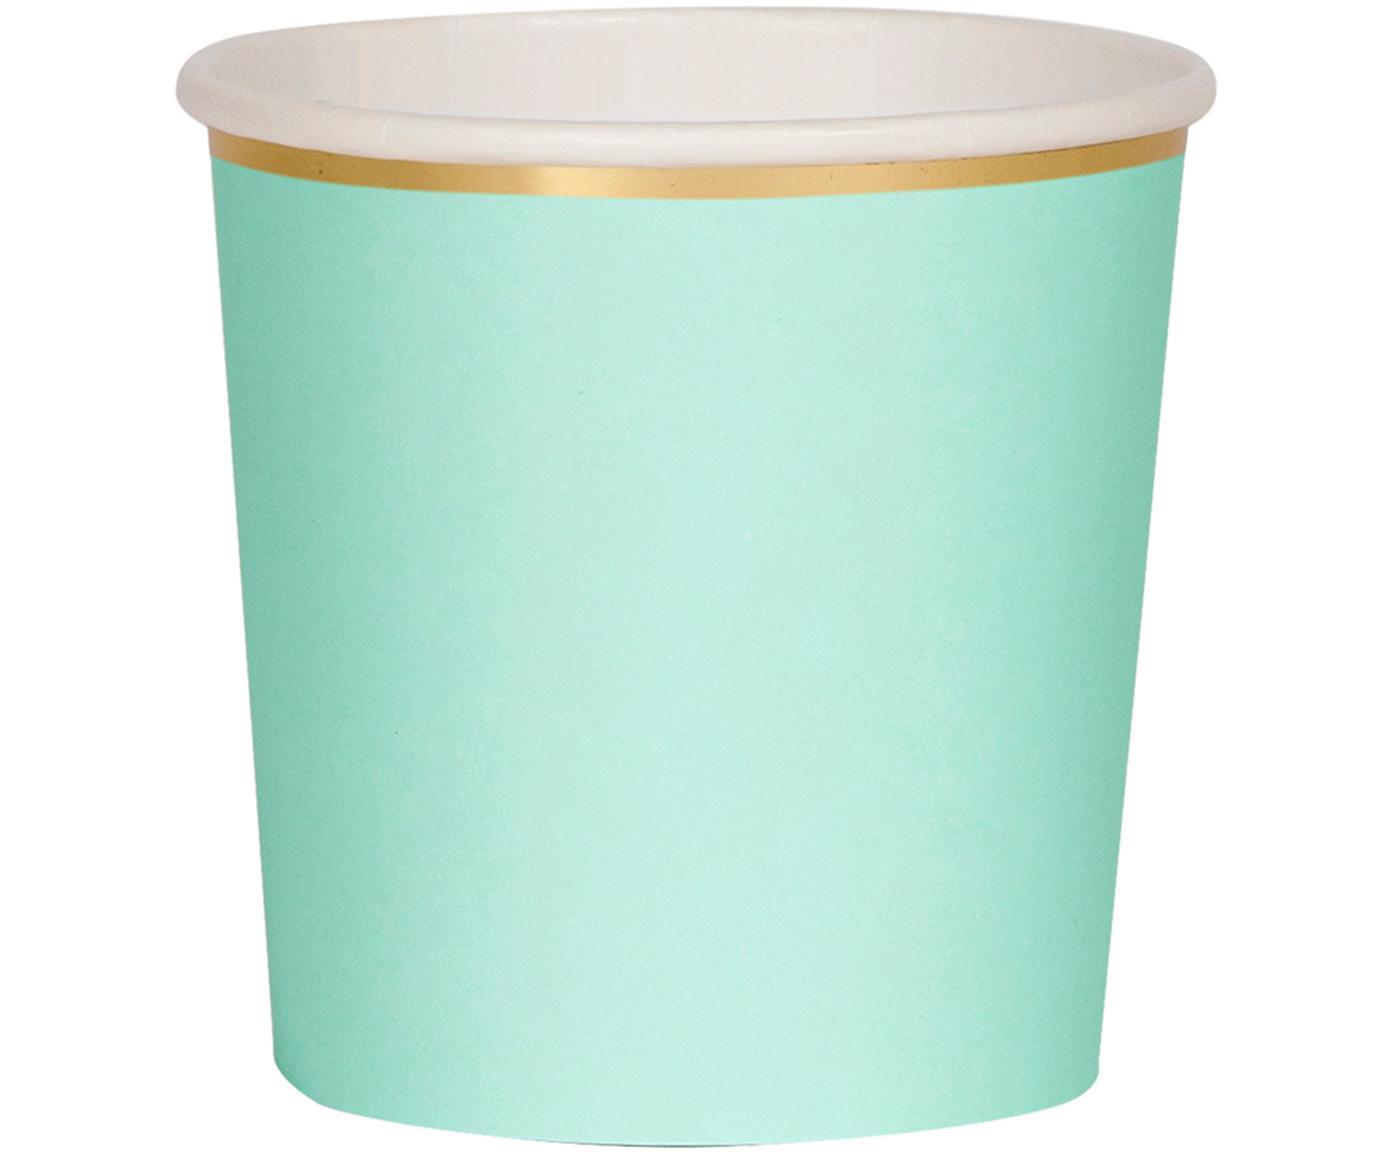 Vasos de papel Simply Eco, 8uds., Papel, foliert, Verde menta, Ø 8 x Al 8 cm